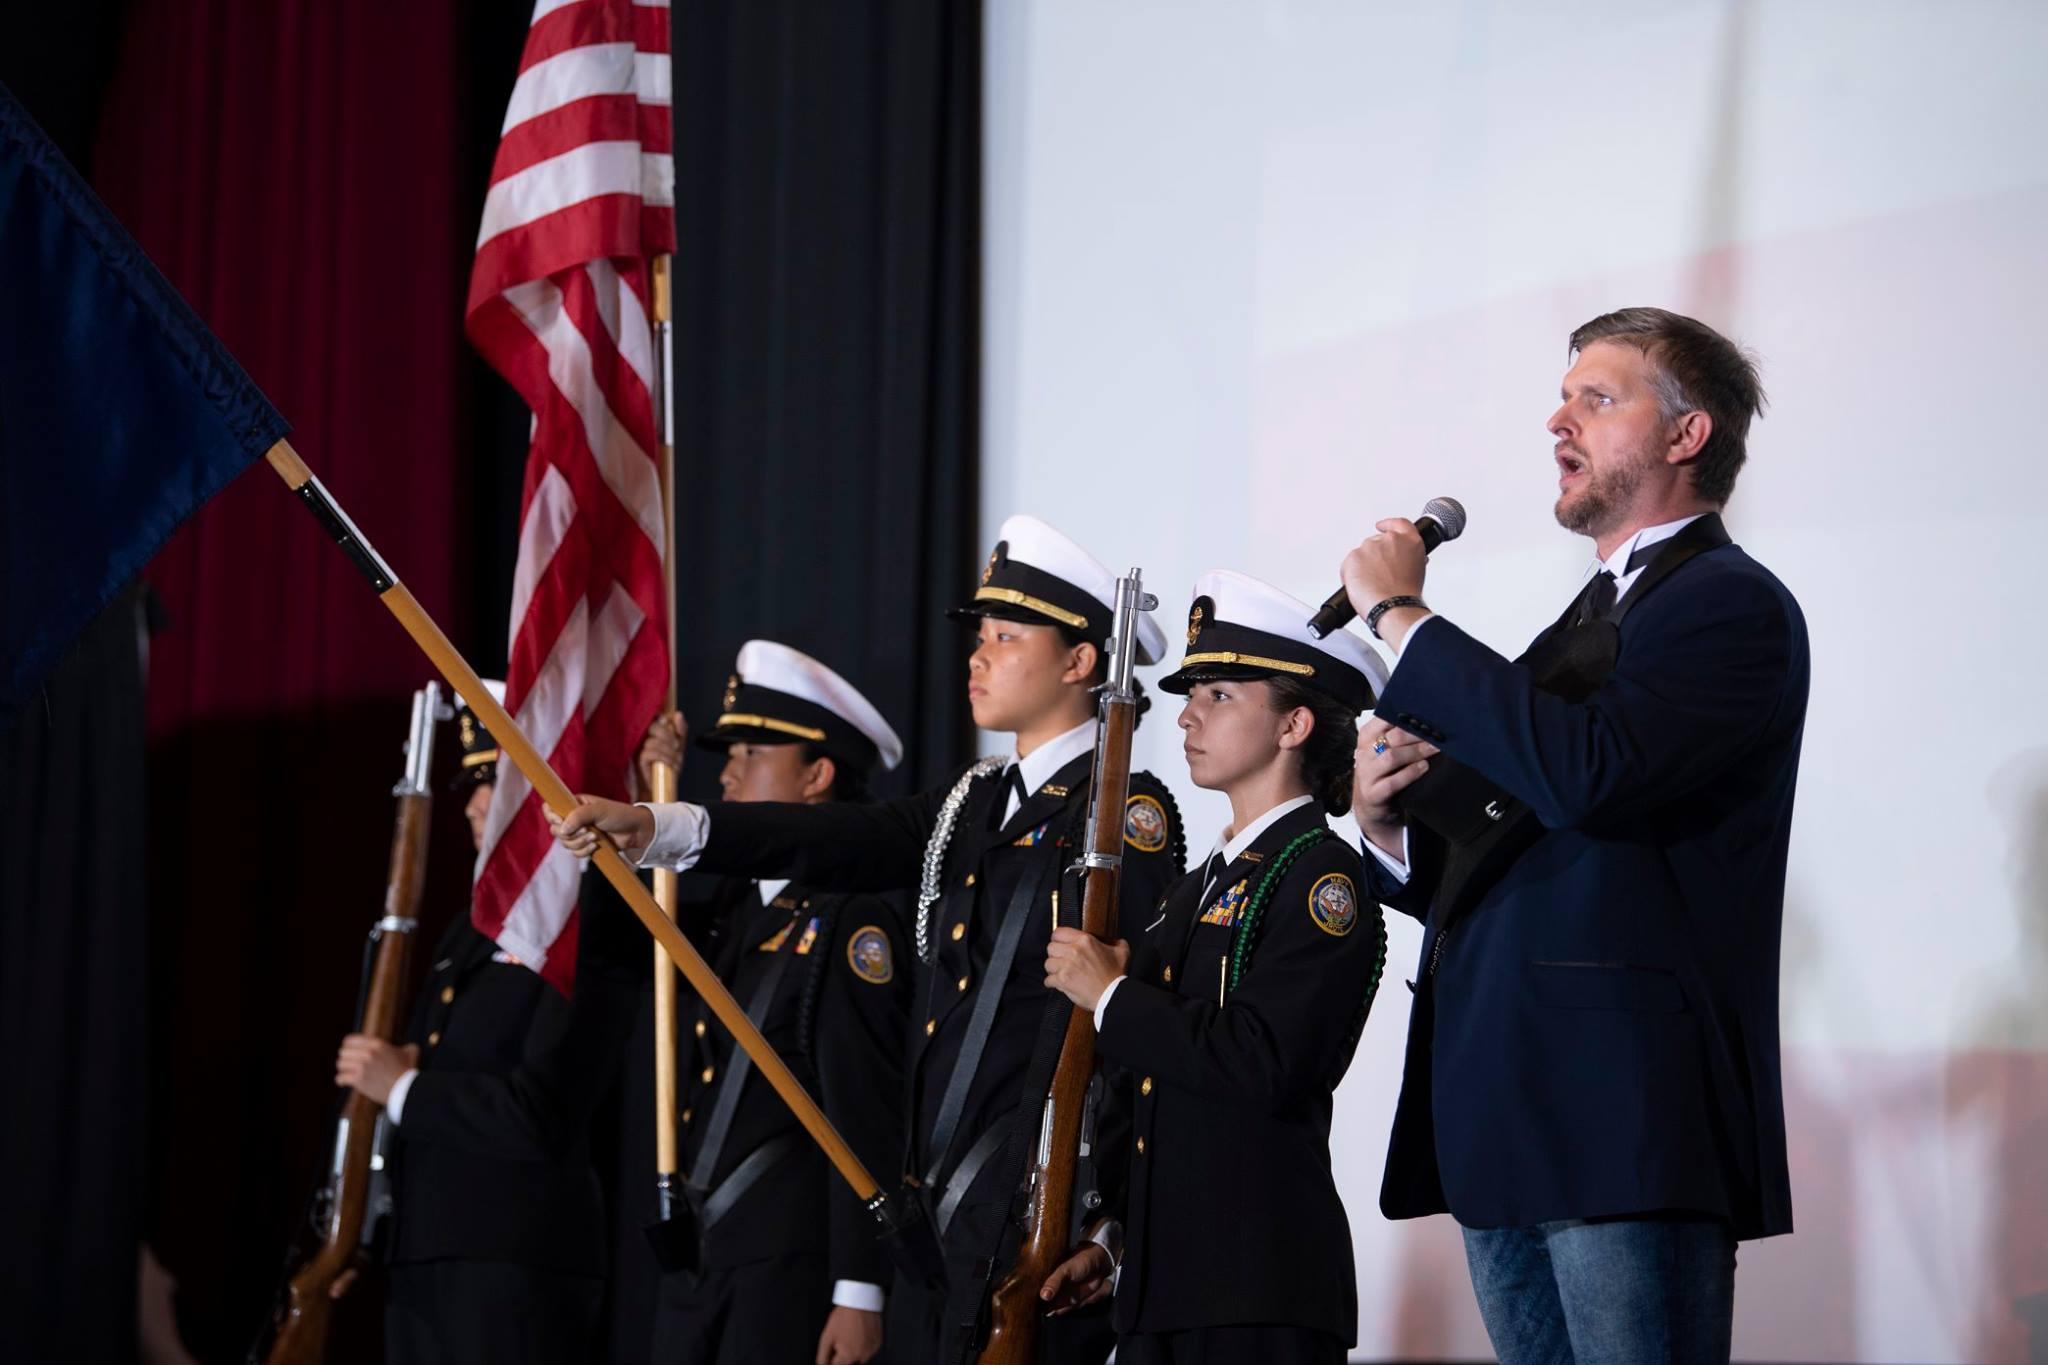 ms-veteran-america-2019-andrew-roby-events